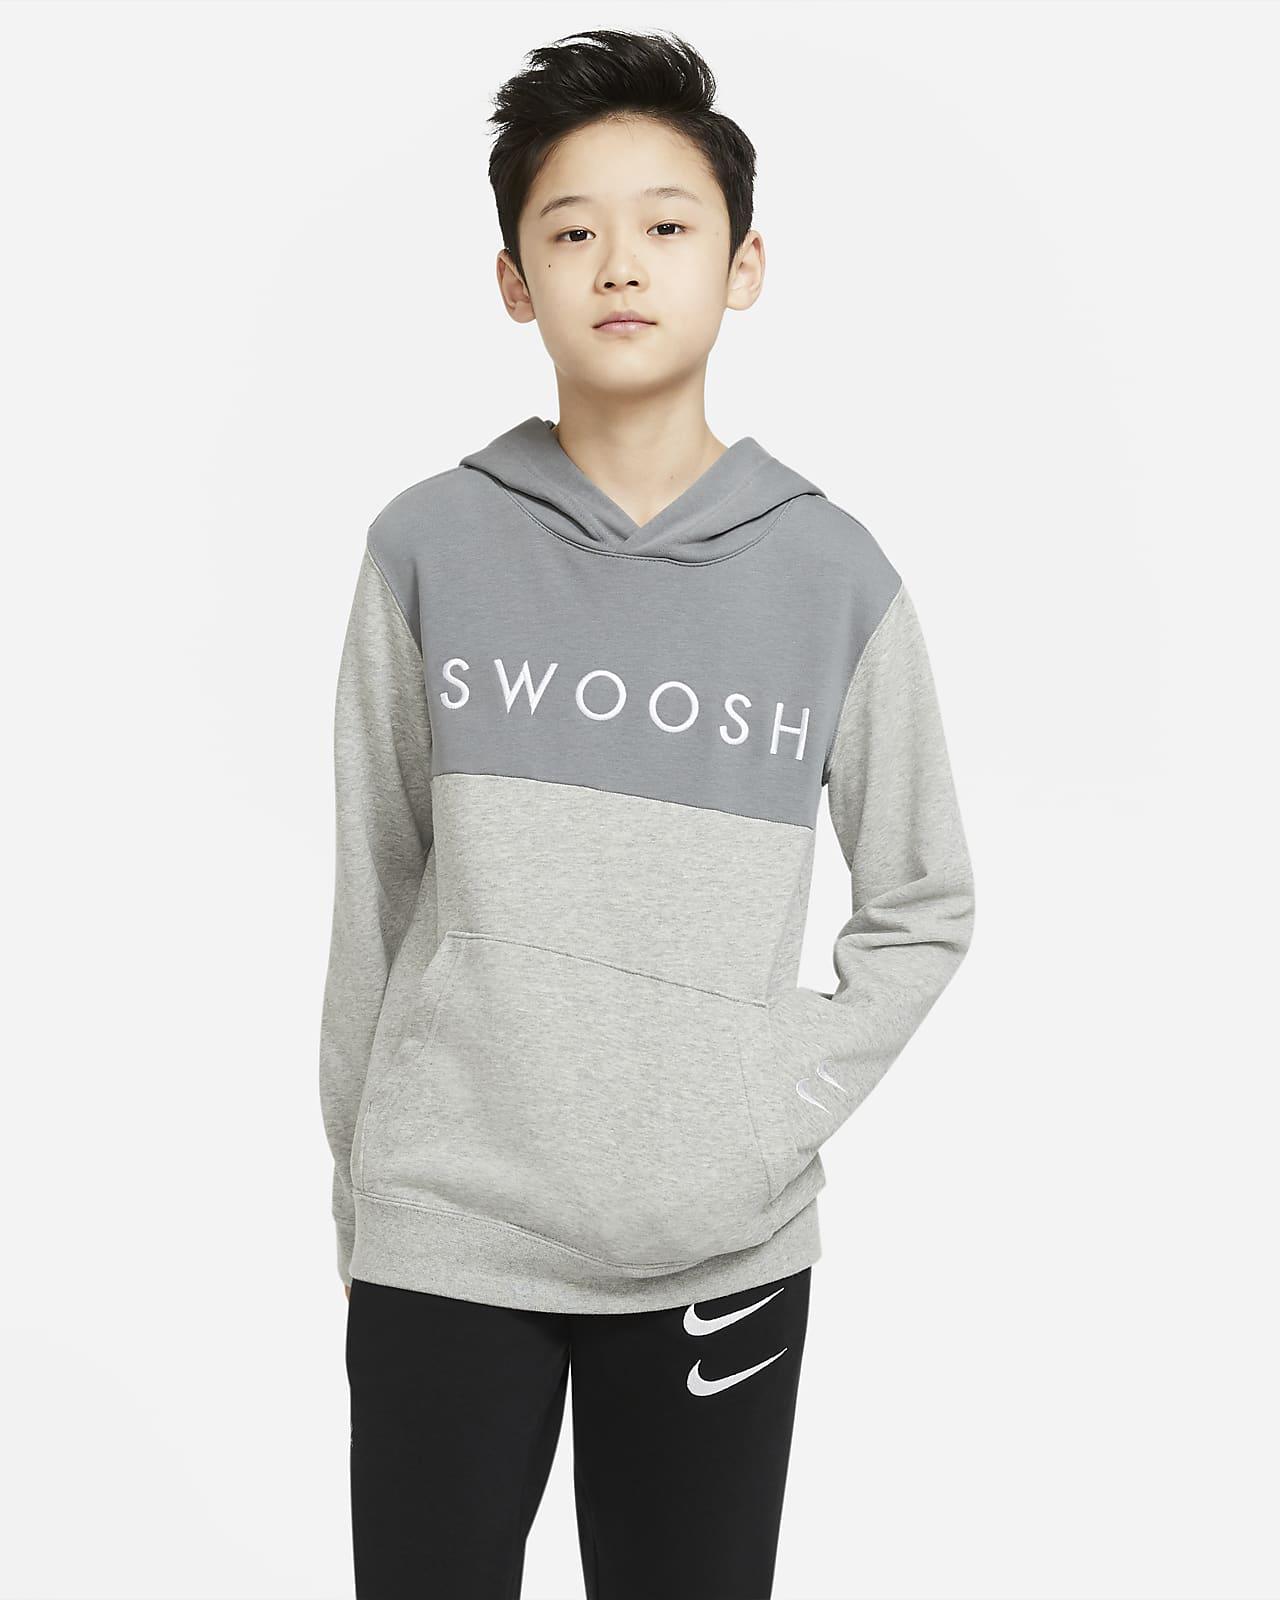 Nike Sportswear Swoosh Older Kids' (Boys') French Terry Hoodie